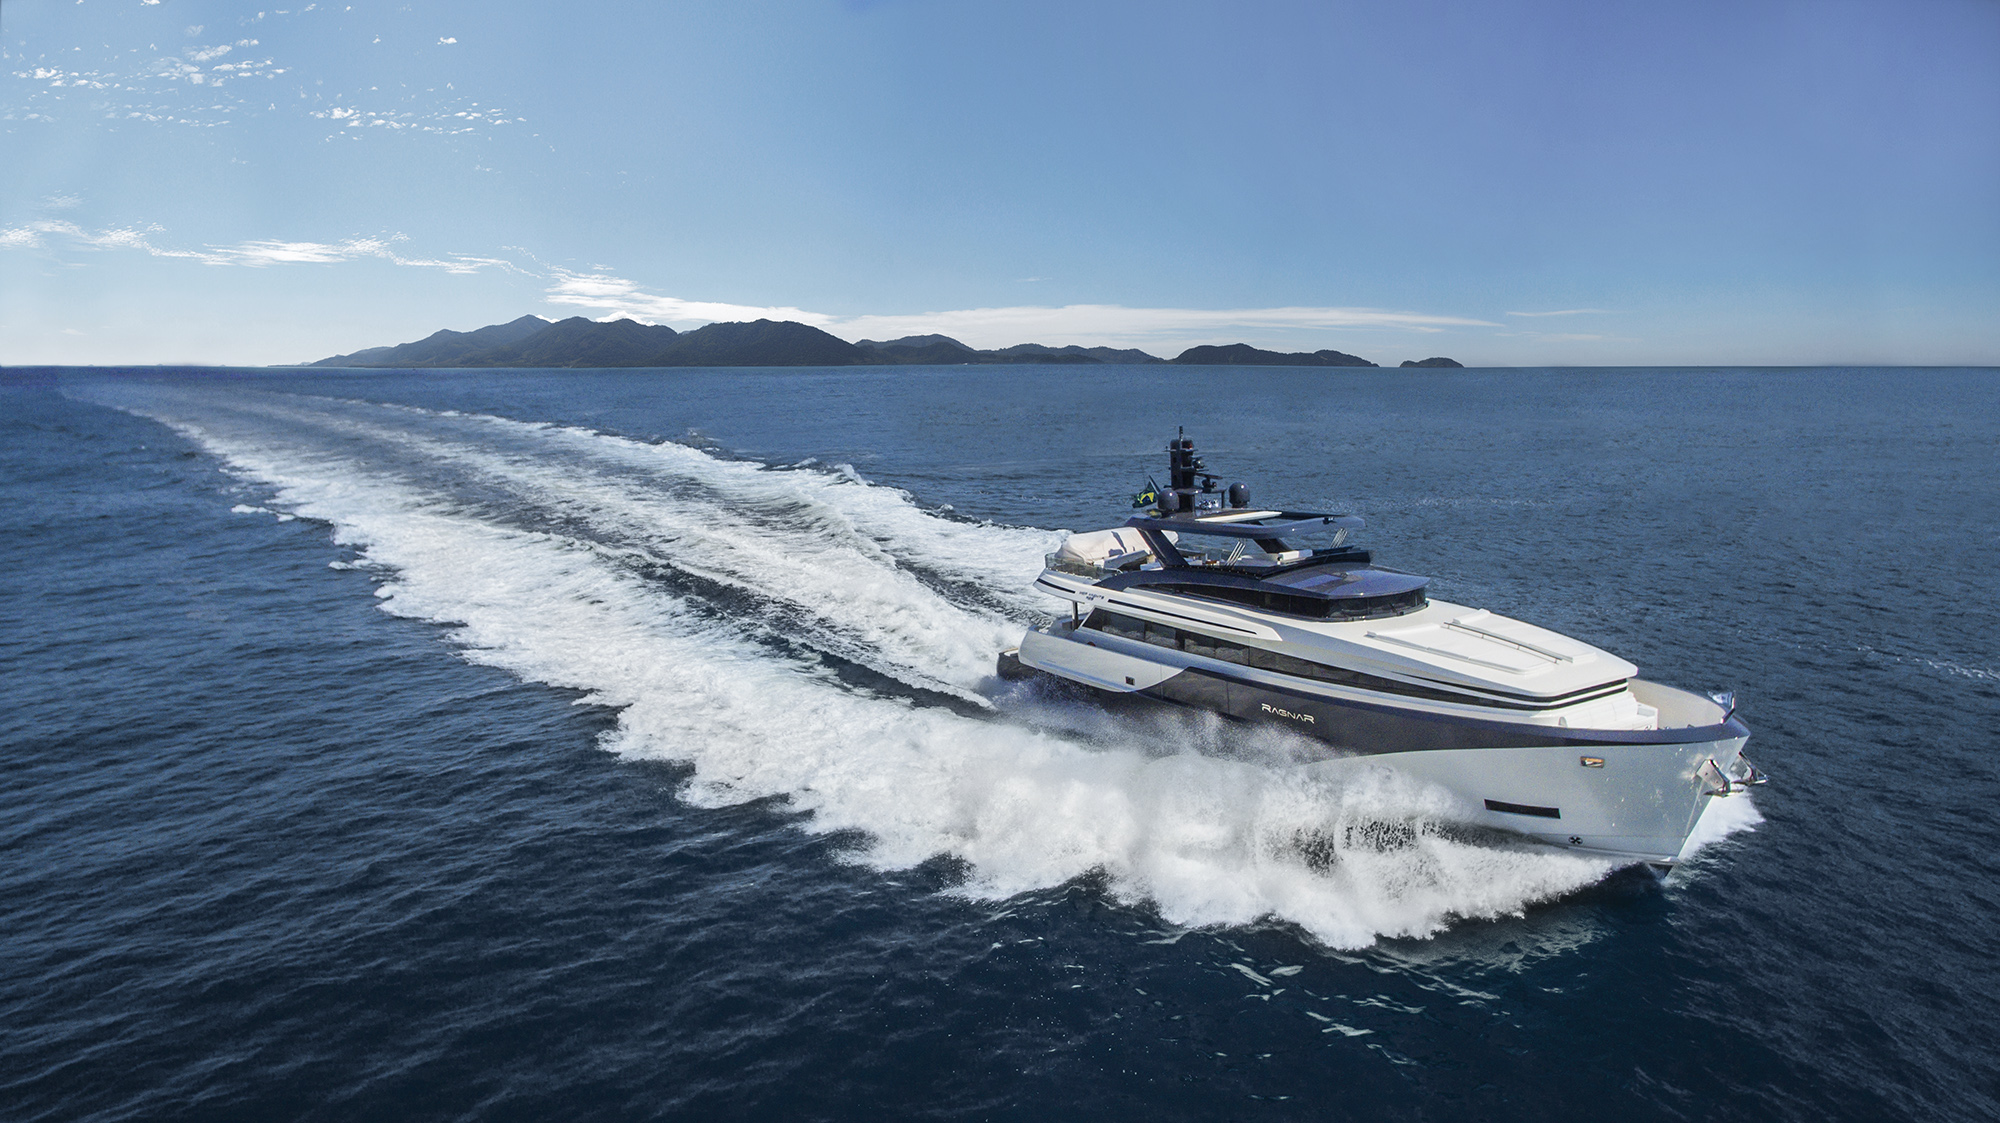 MCP 925 motor yacht RAGNAR - © MCP Yachts